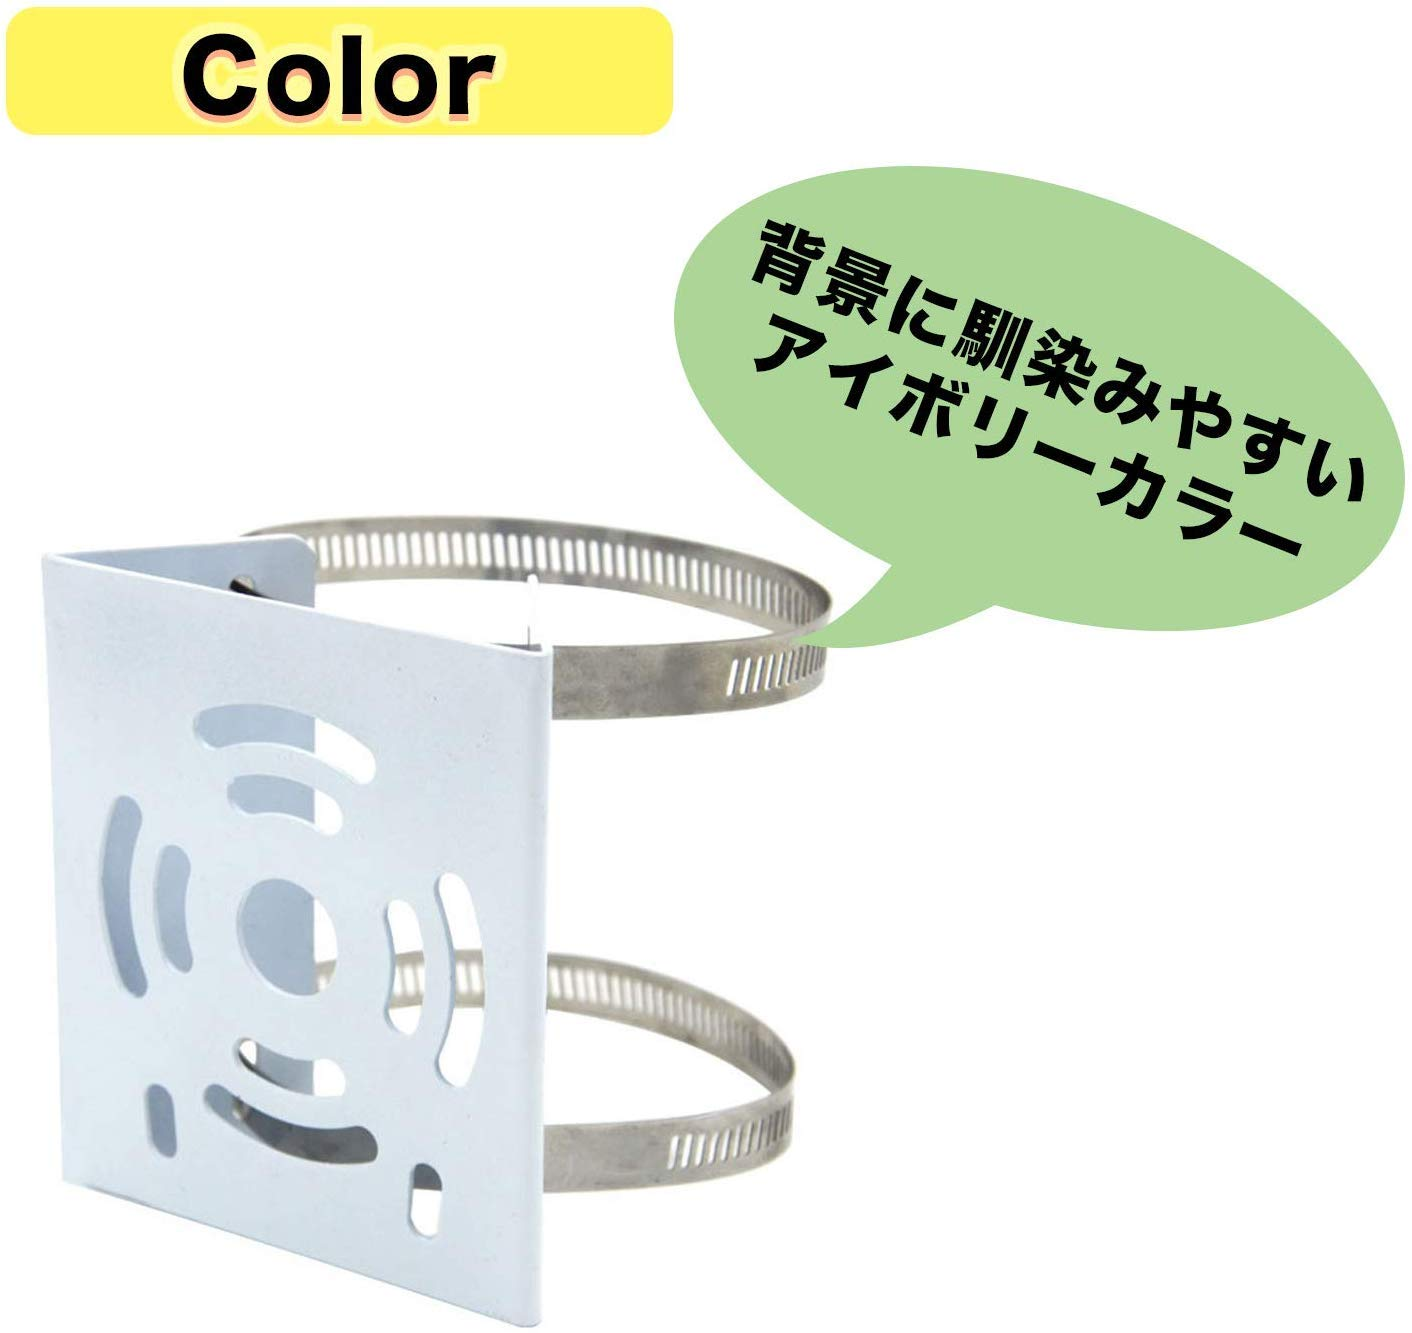 /118/dID525VX G /& B /42/ R pour: Yamaha 900/TDM Kit s-AC 16/